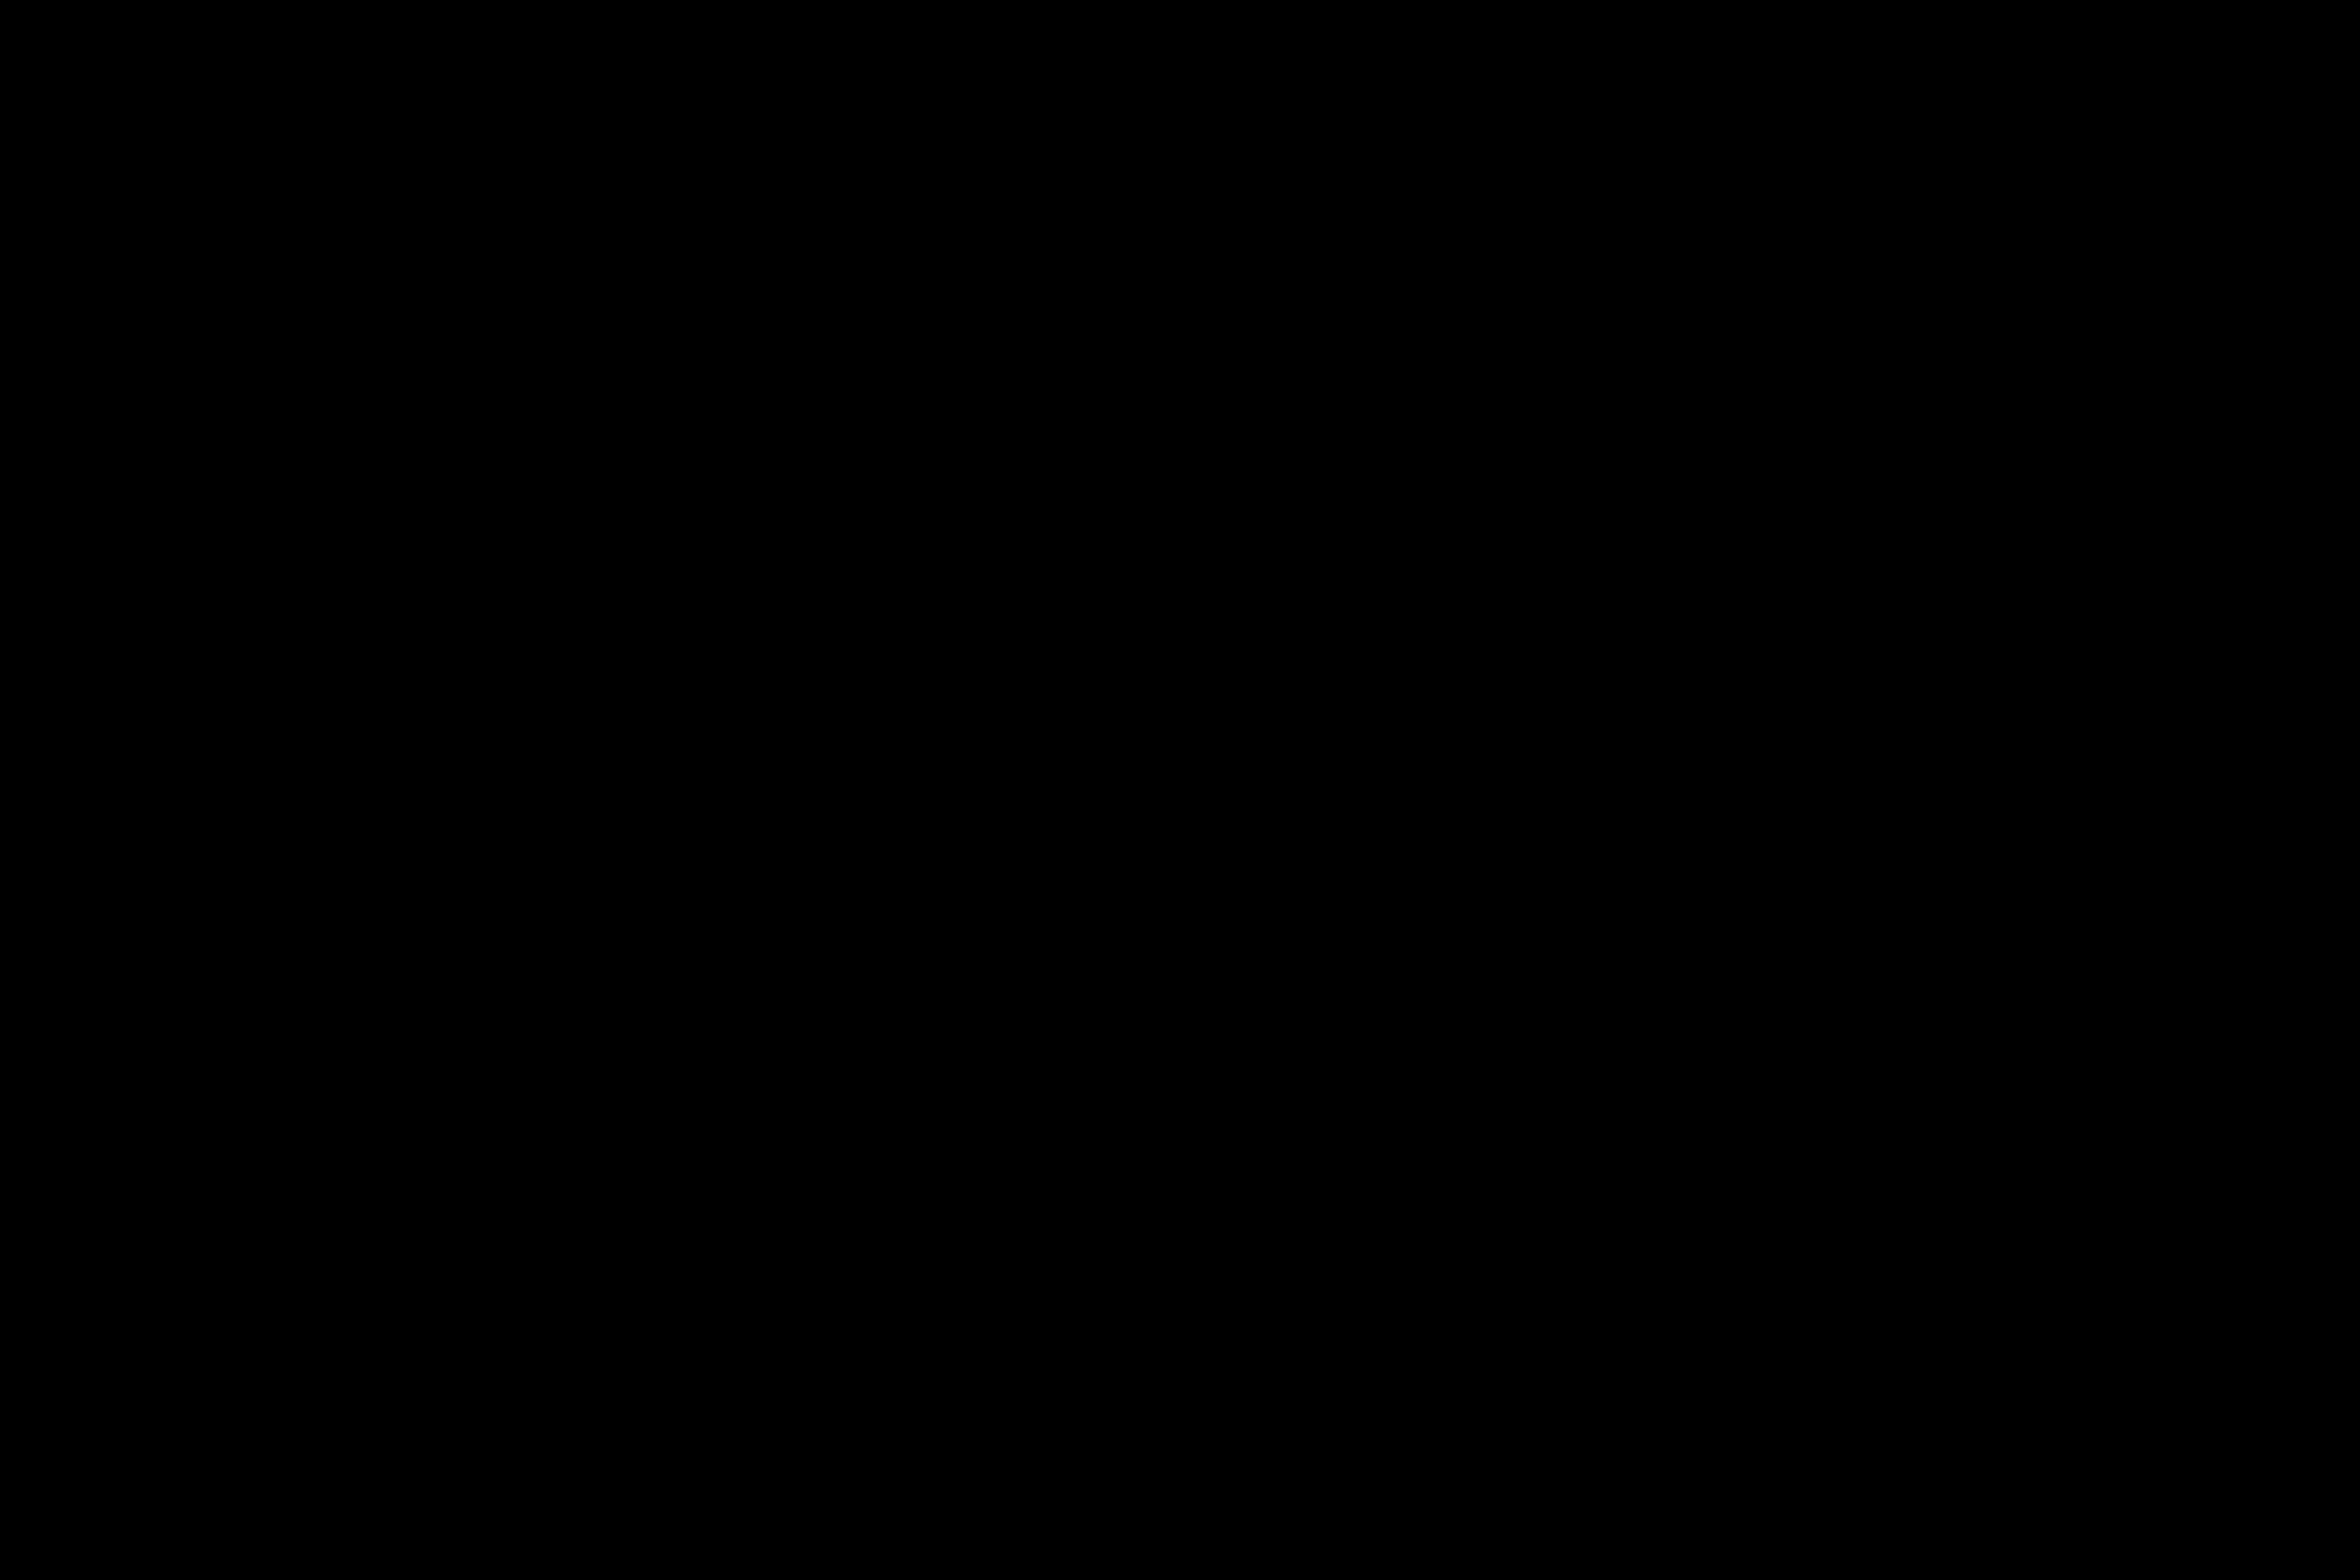 rj0506